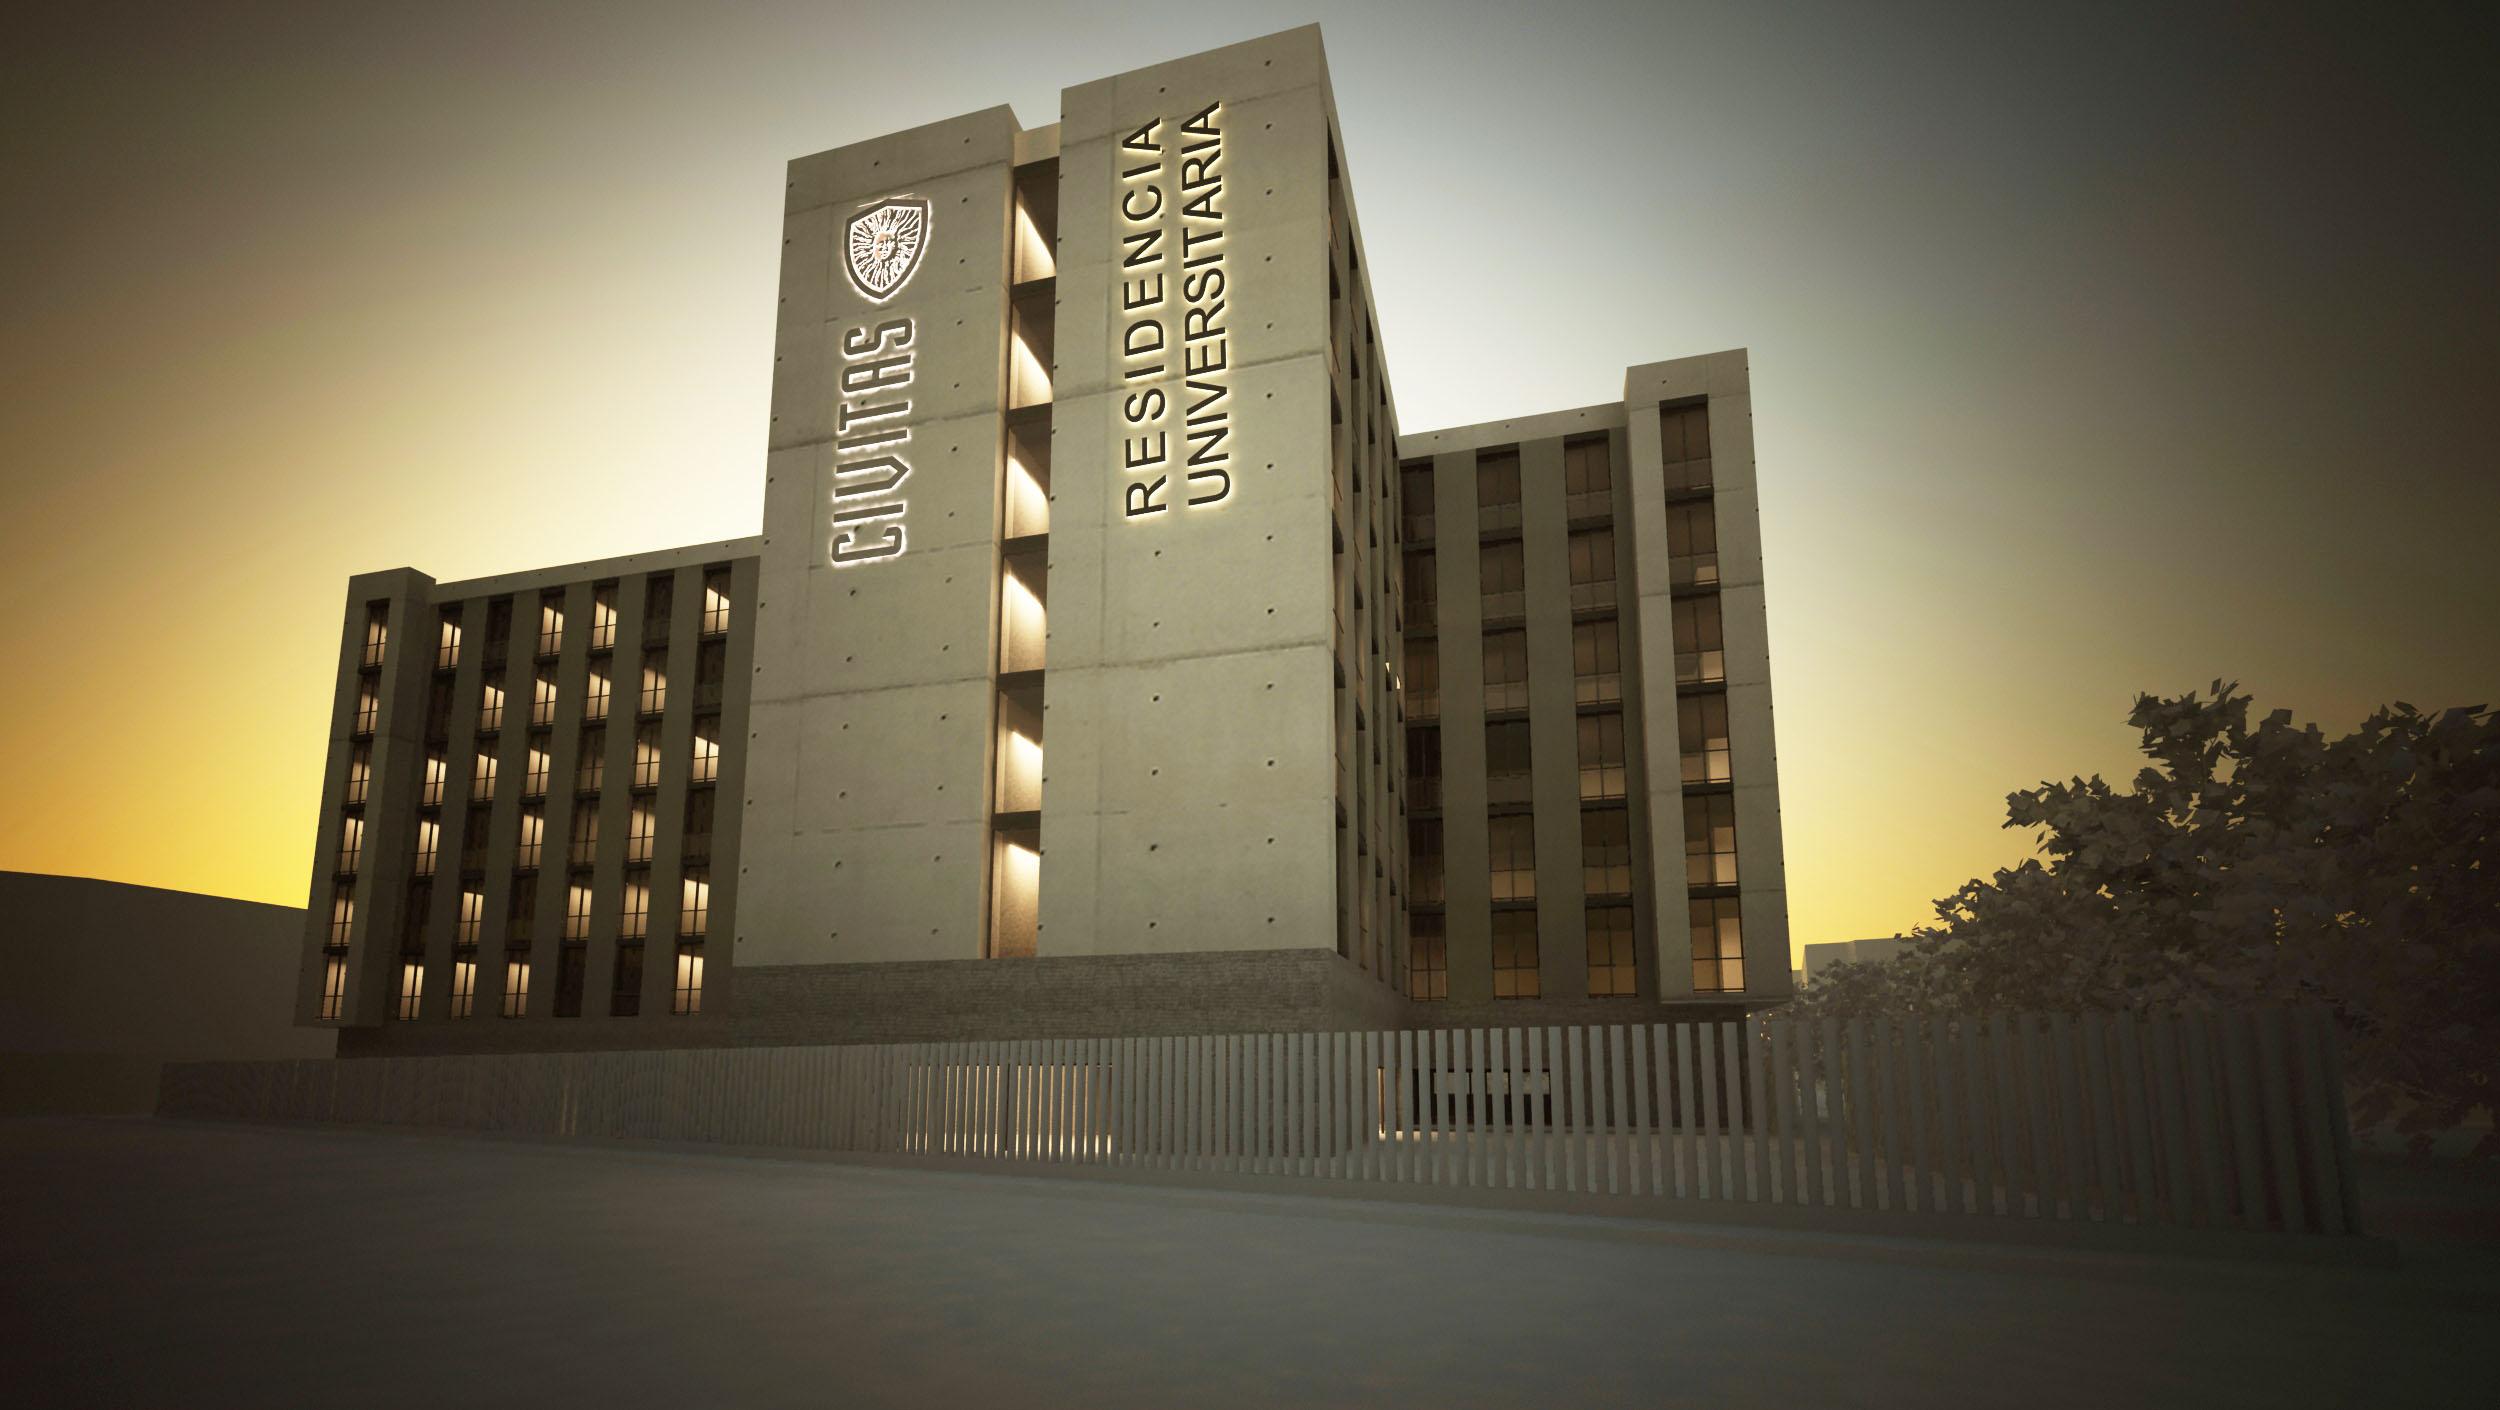 Residencia Universitaria Almería Civitas